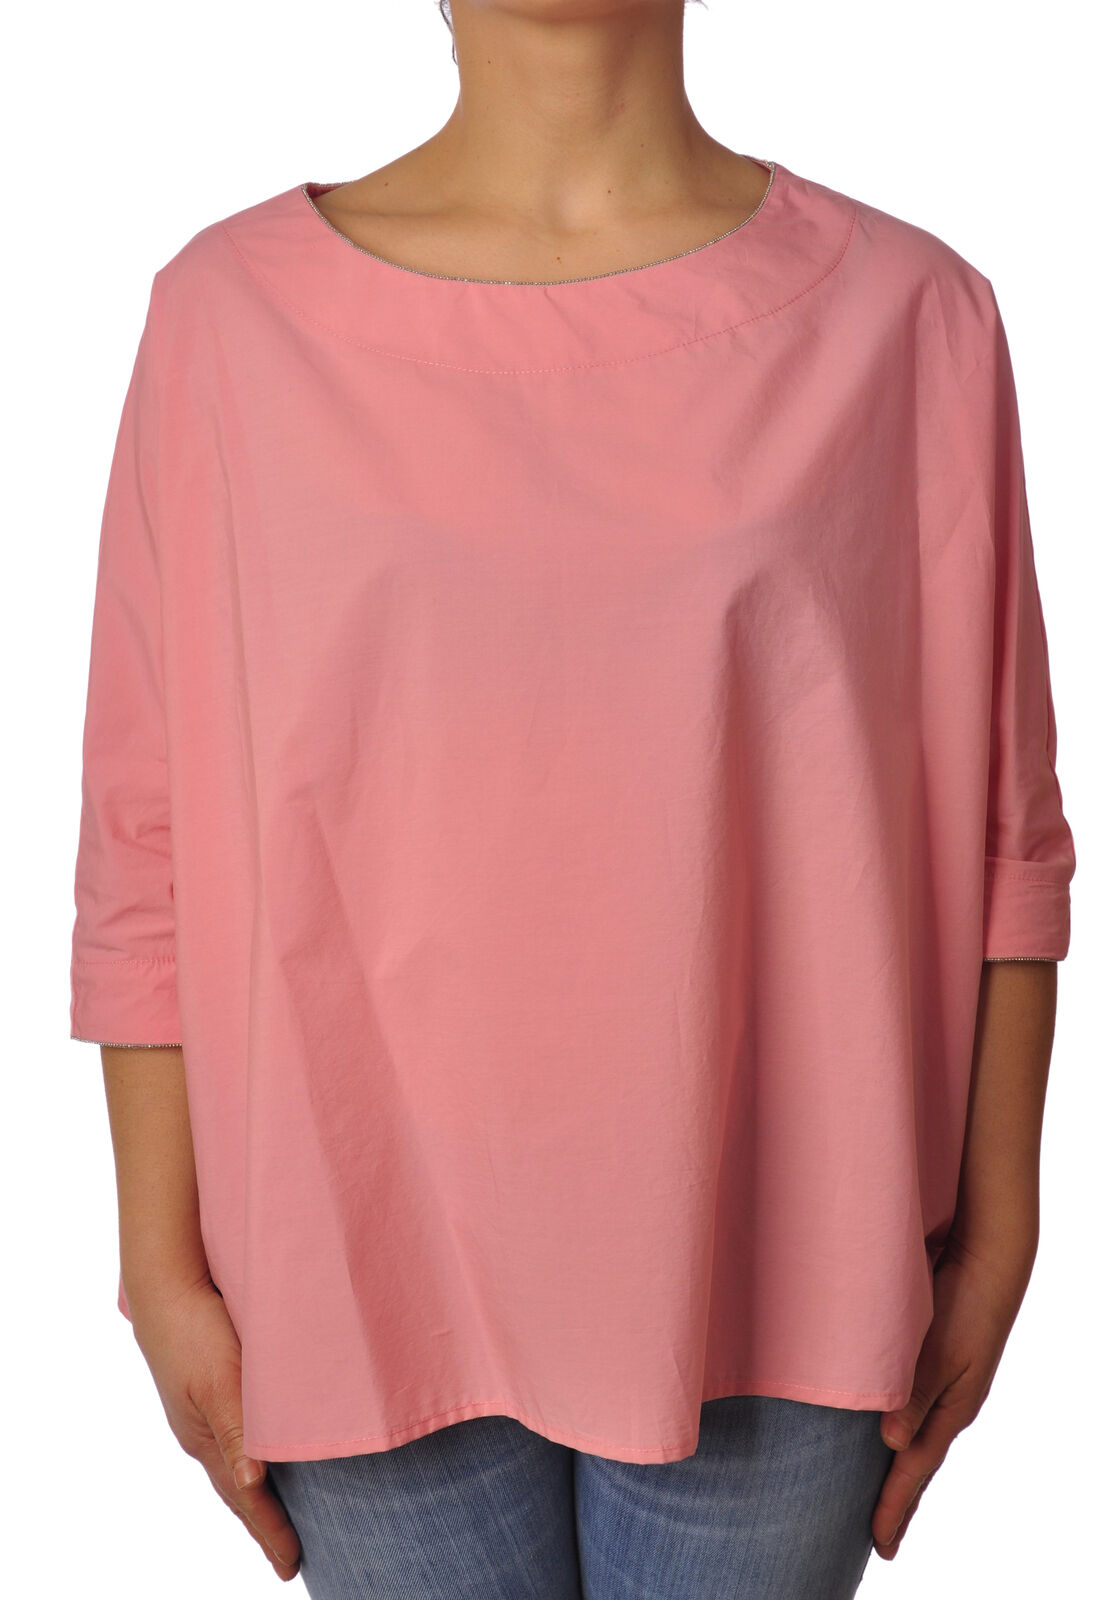 Ottod'ame - Shirts-Shirt - Woman - Rosa - 4953223B180932